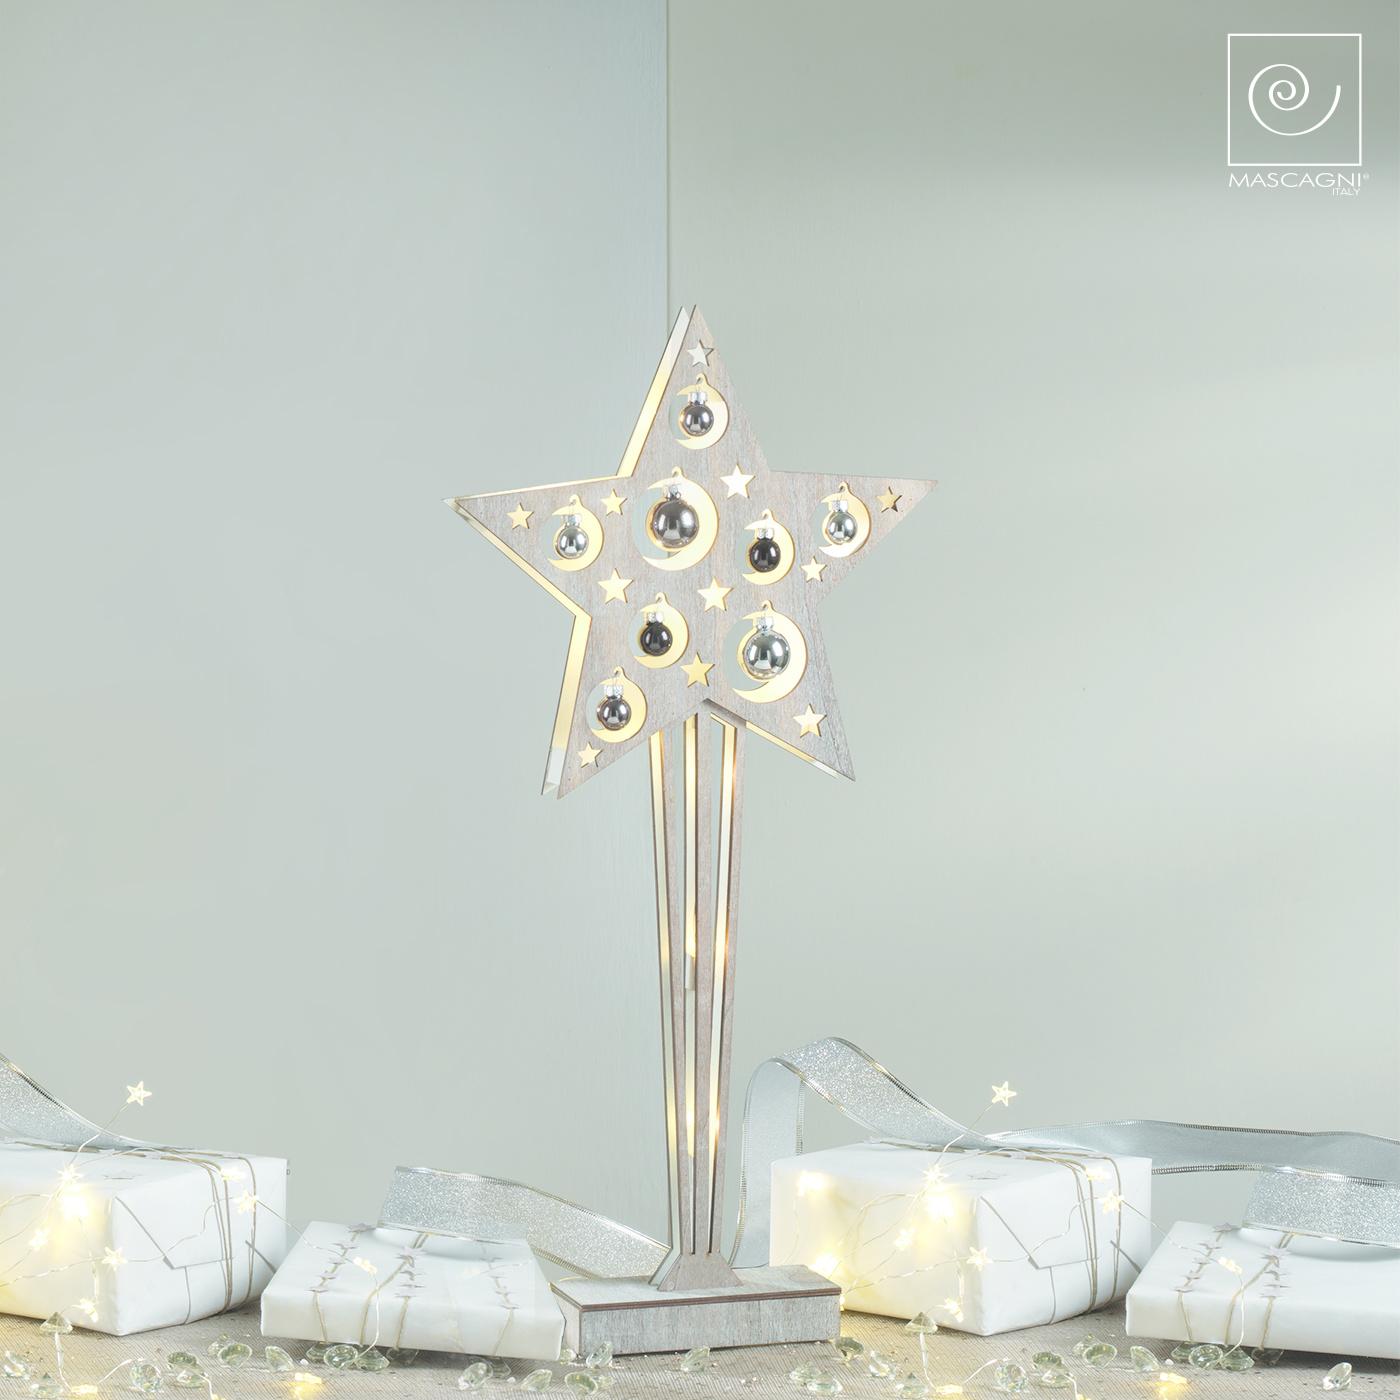 Art Mascagni LED STAR CM.57 - COL. NOCE